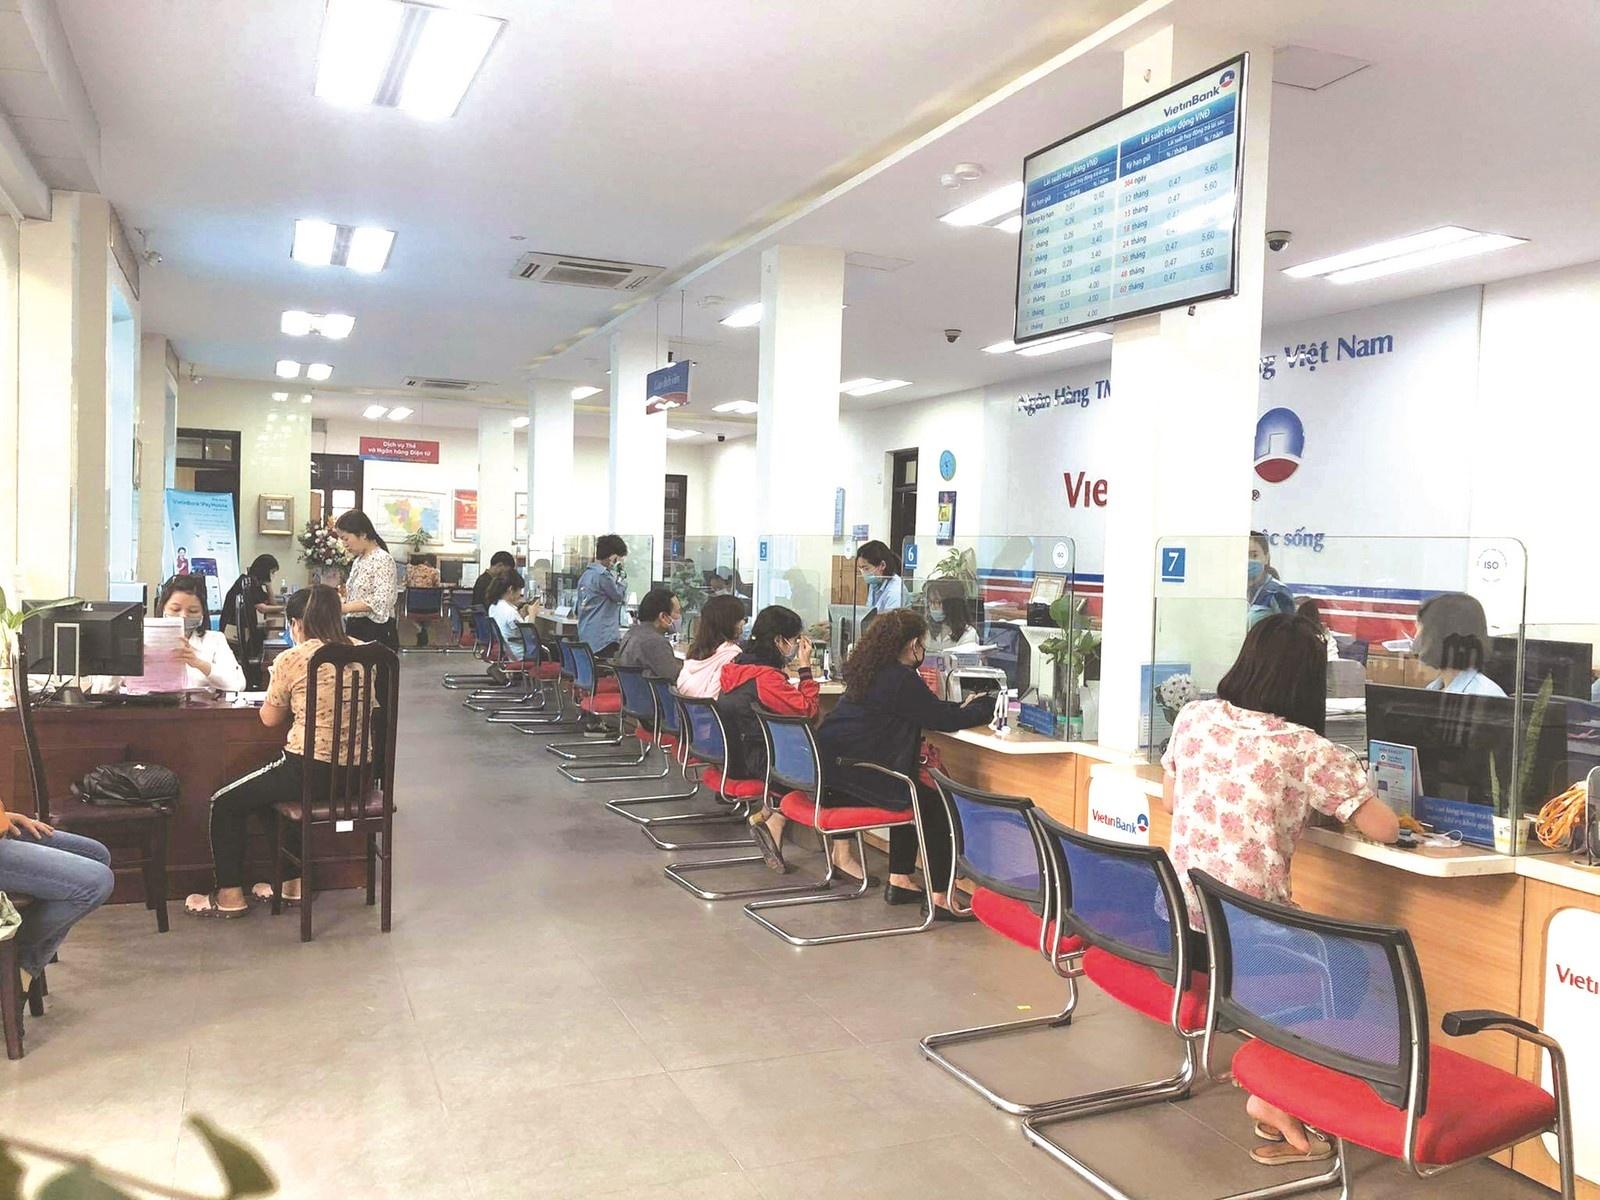 nganh ngan hang thai binh chia lua cung doanh nghiep va nguoi dan vuot kho